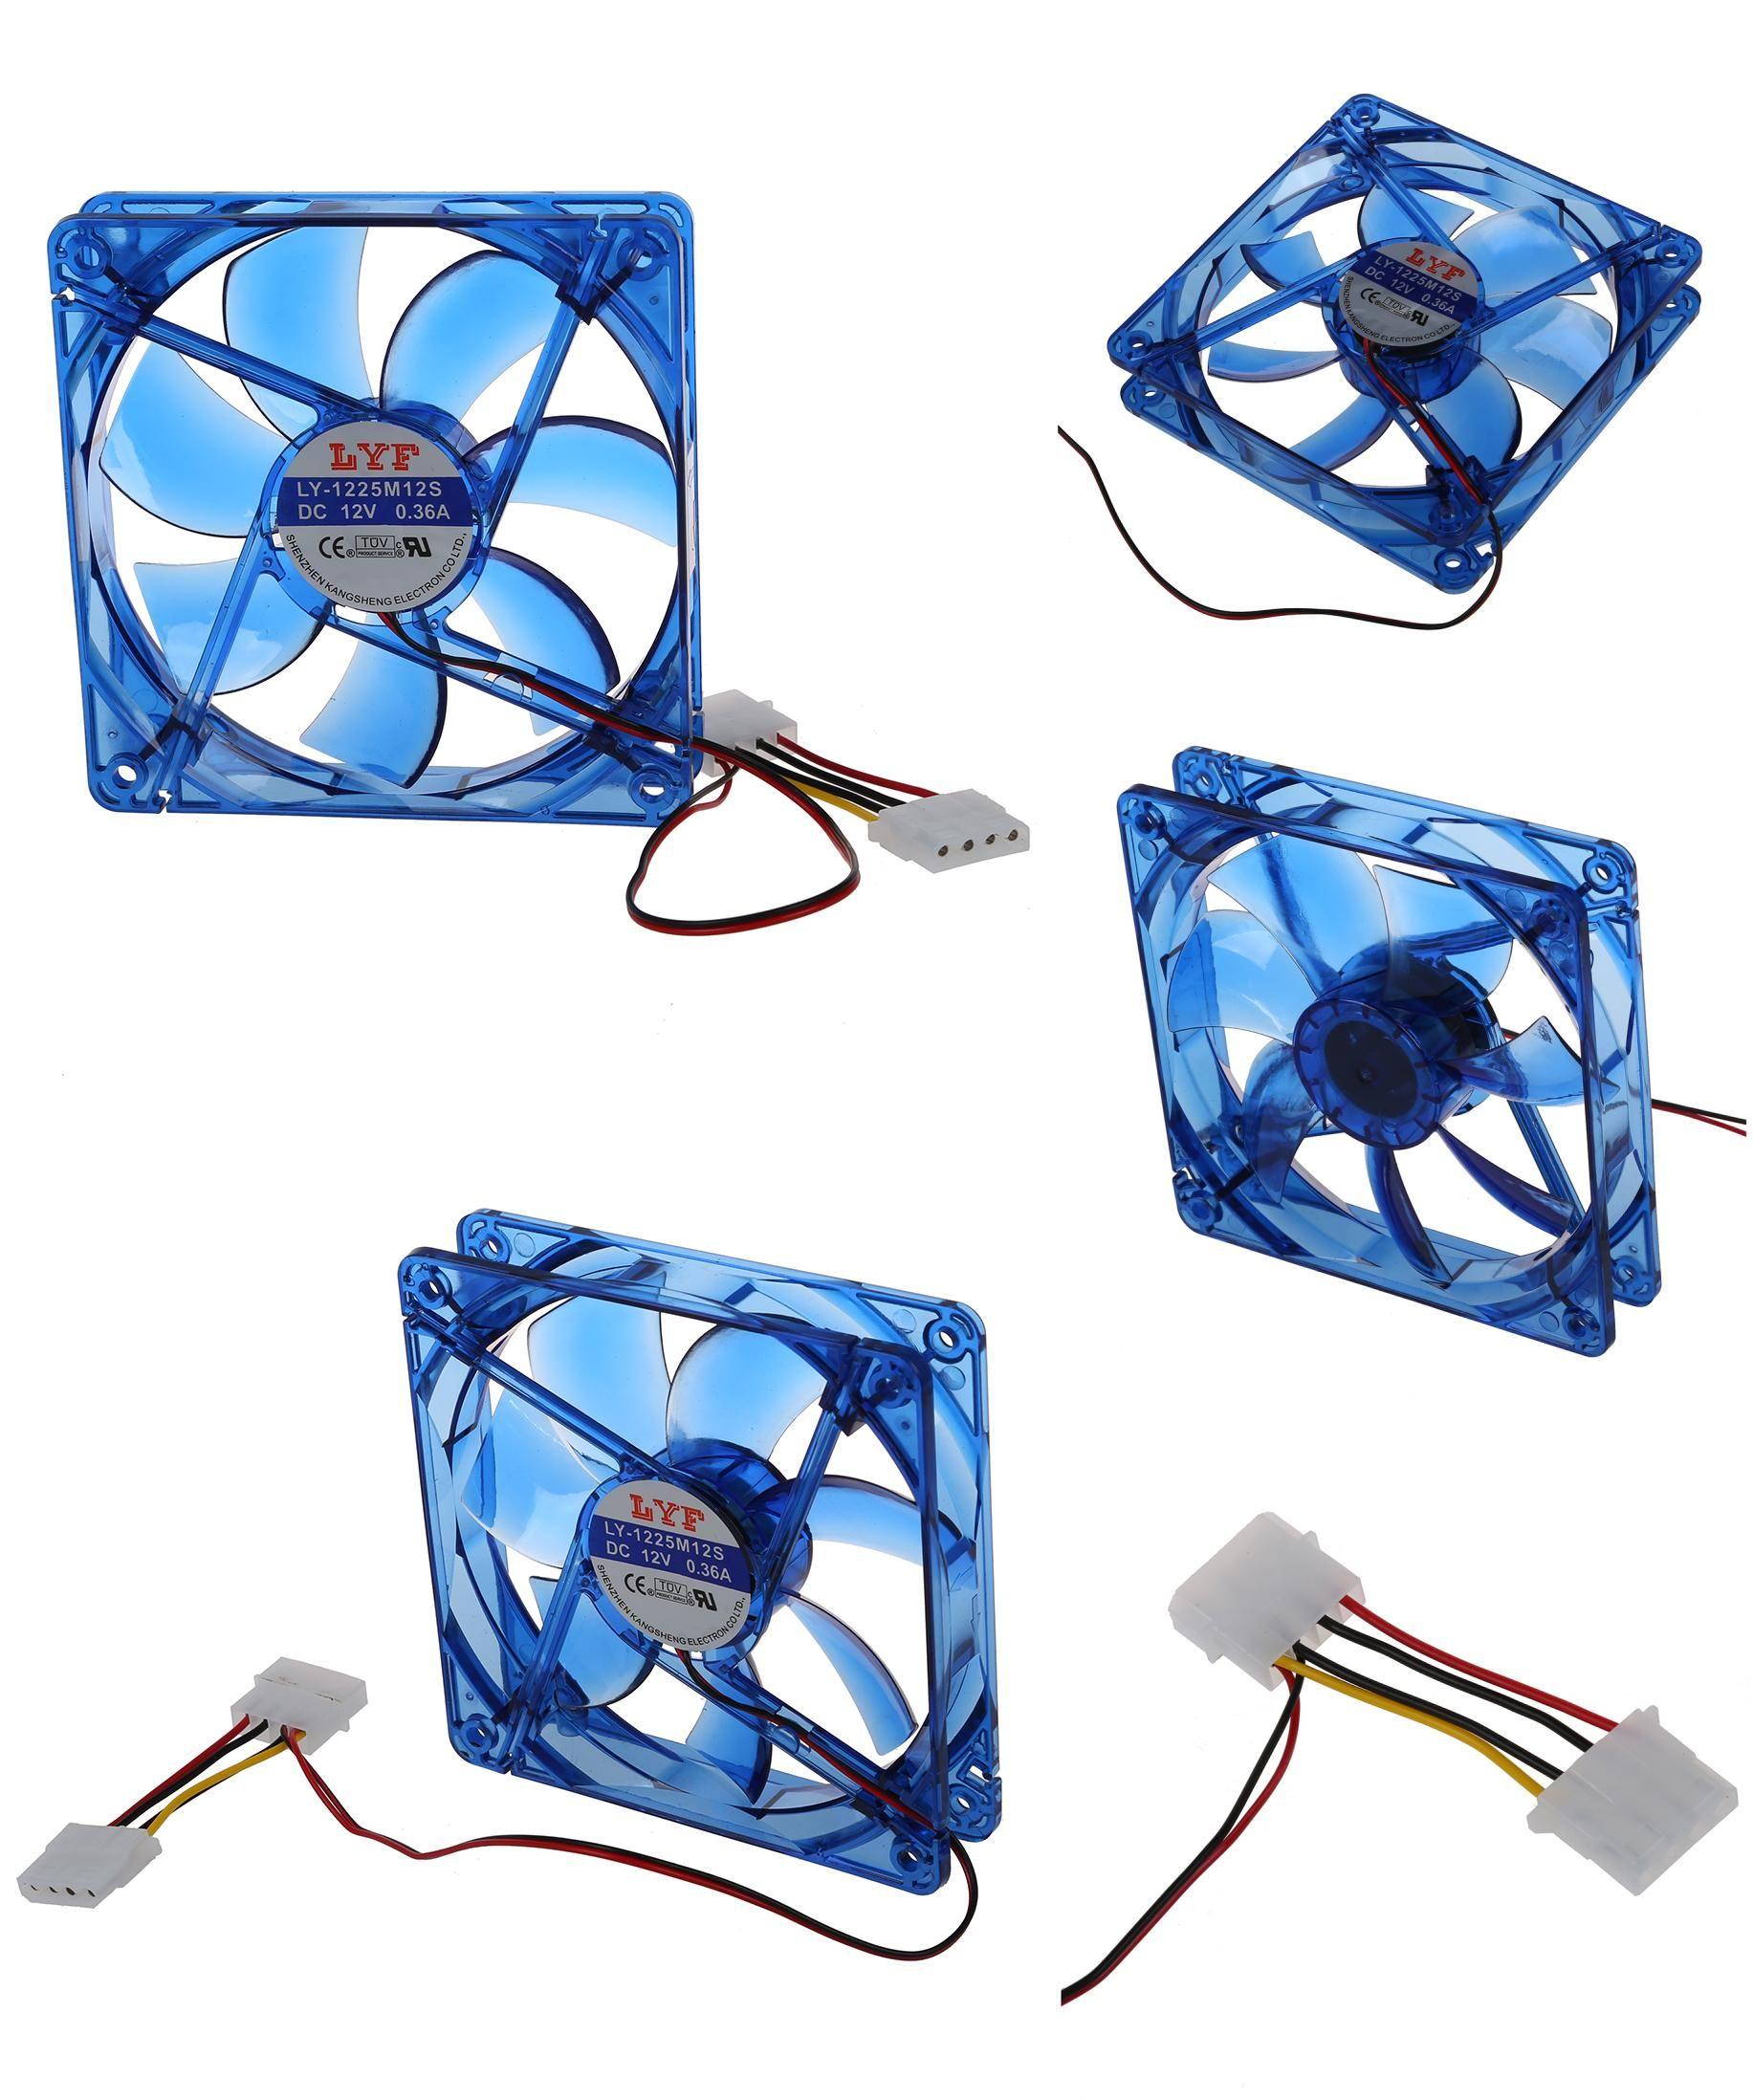 Visit To Buy Dc 12v 4 Pin 4 Blue Led Pc Computer Enclosure Fan 120 X 25 Mm Advertisement Computer Fan Pc Computer Cheap Fans